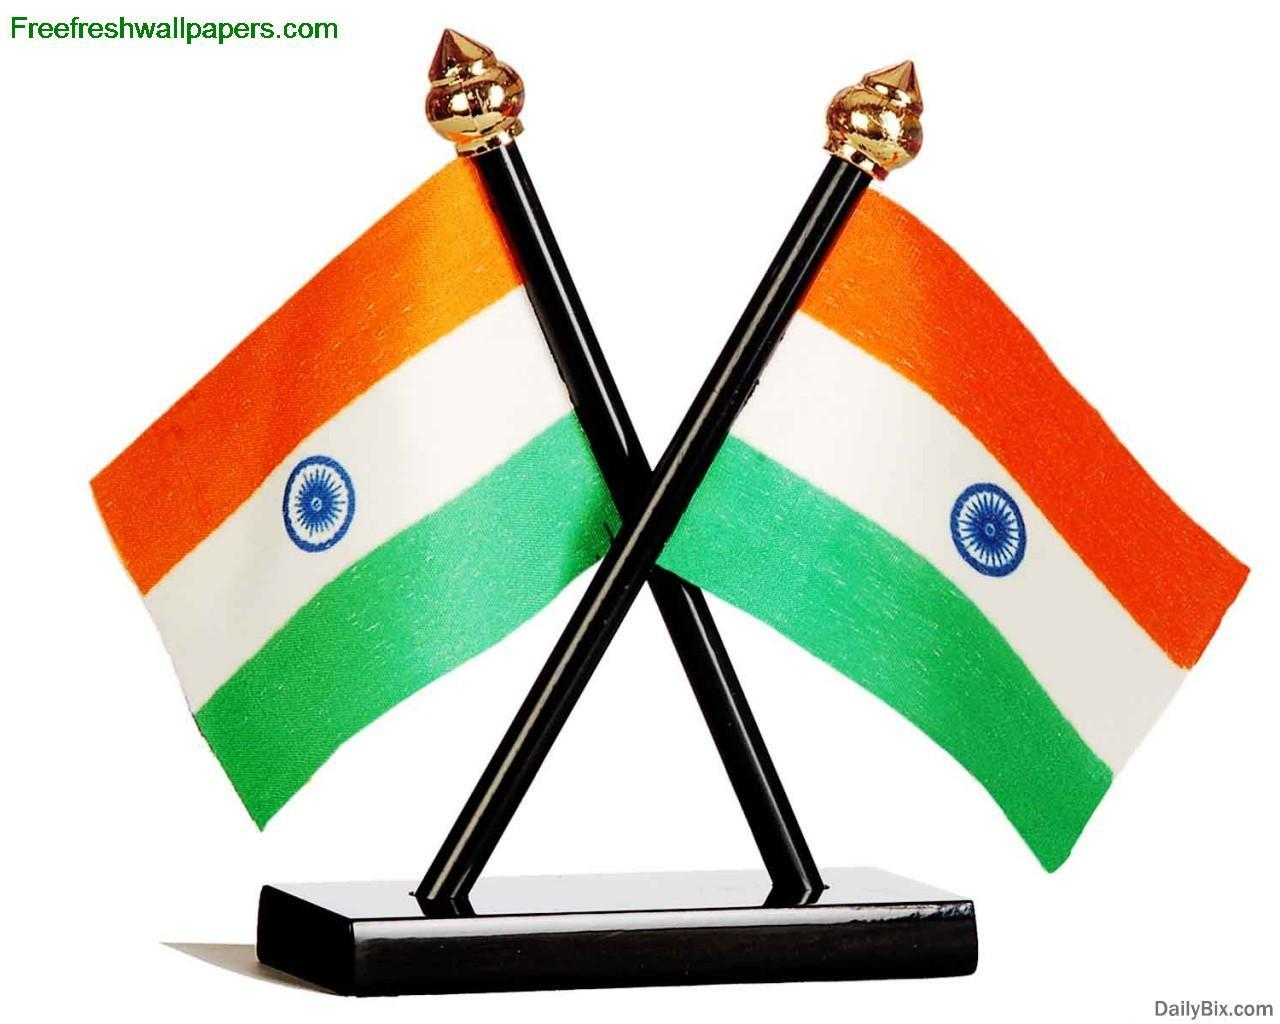 Indian Flag Hd Wallpaper 1080p: Indian Flag HD Wallpapers